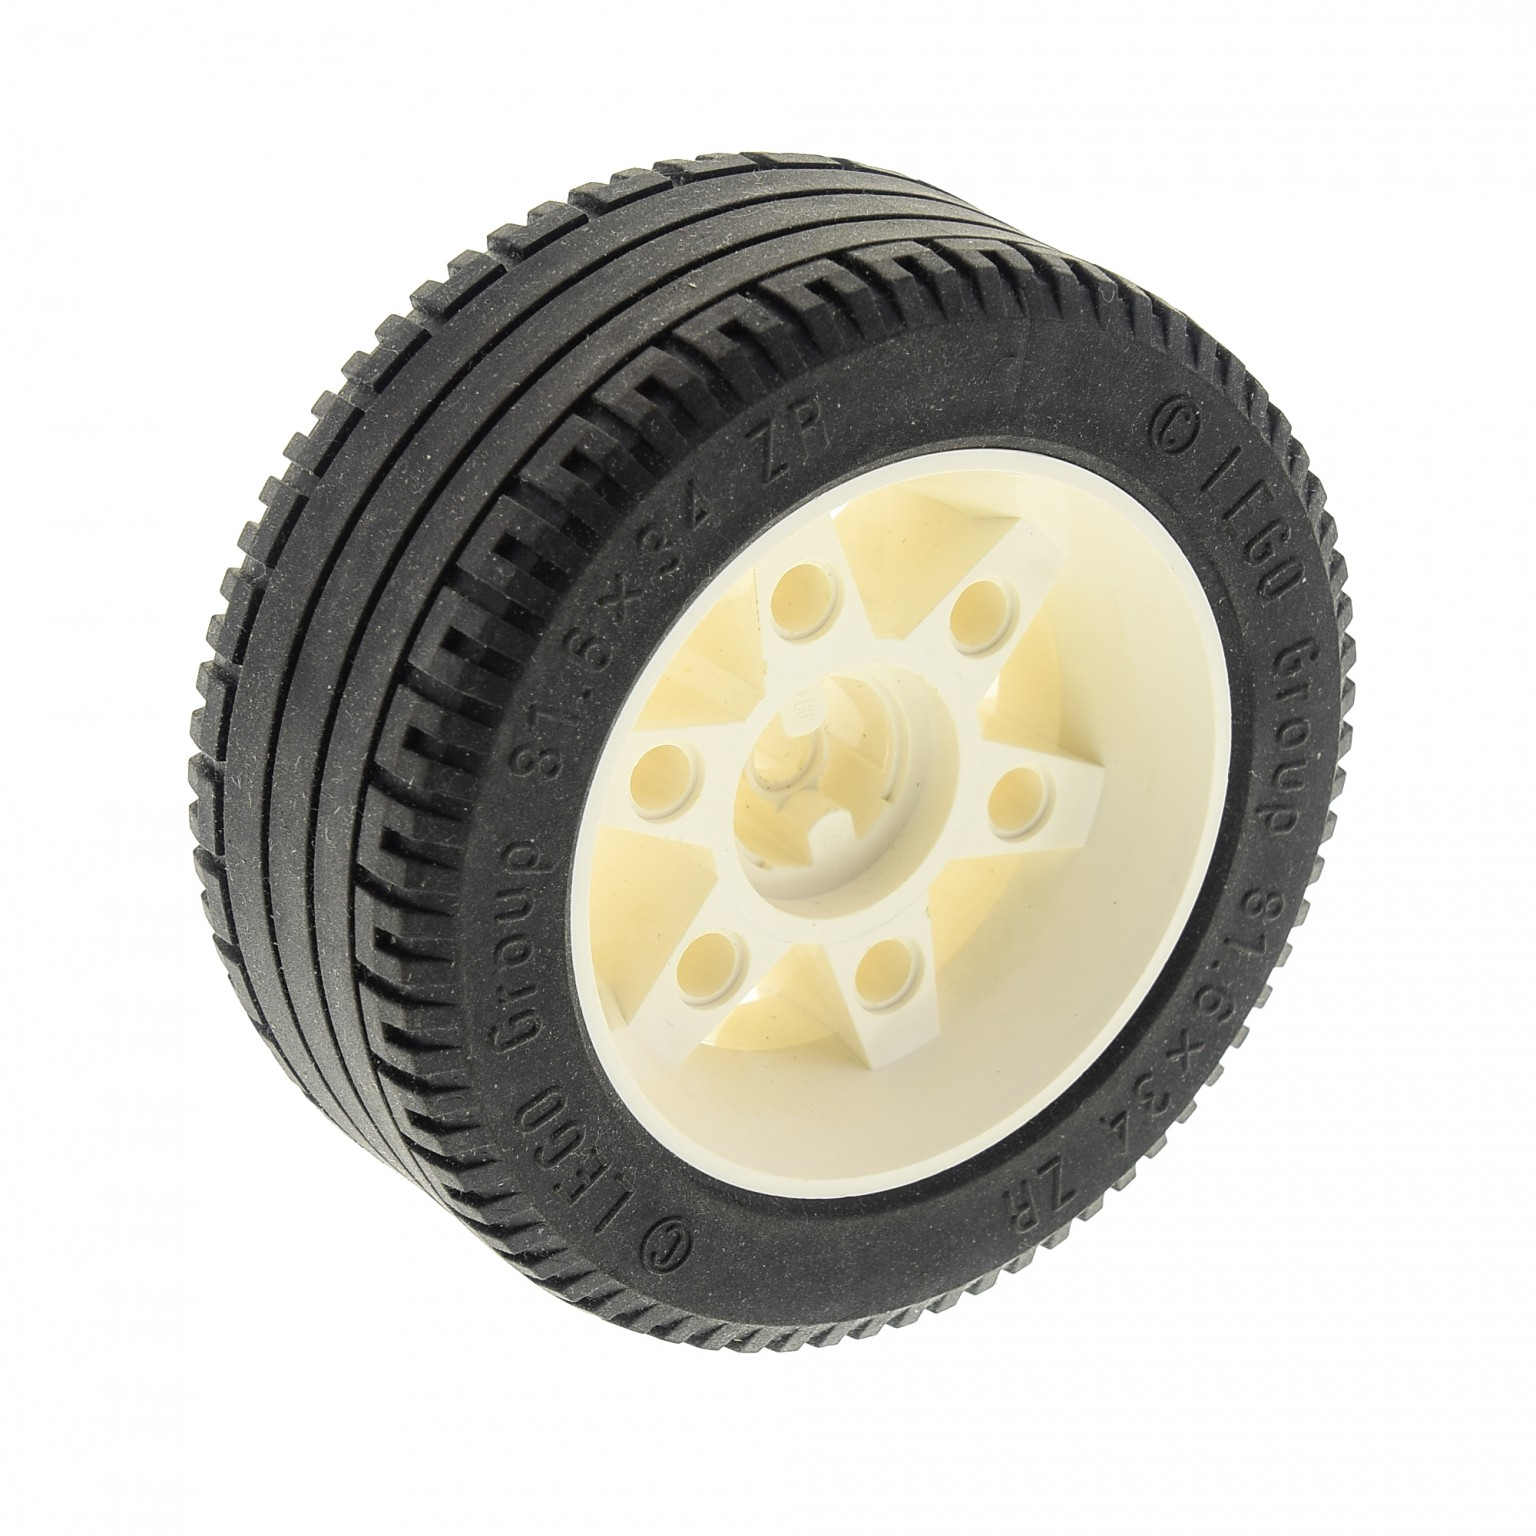 LEGO® 1 x Eisenbahn Rad RC mit Gummi schwarz #55423